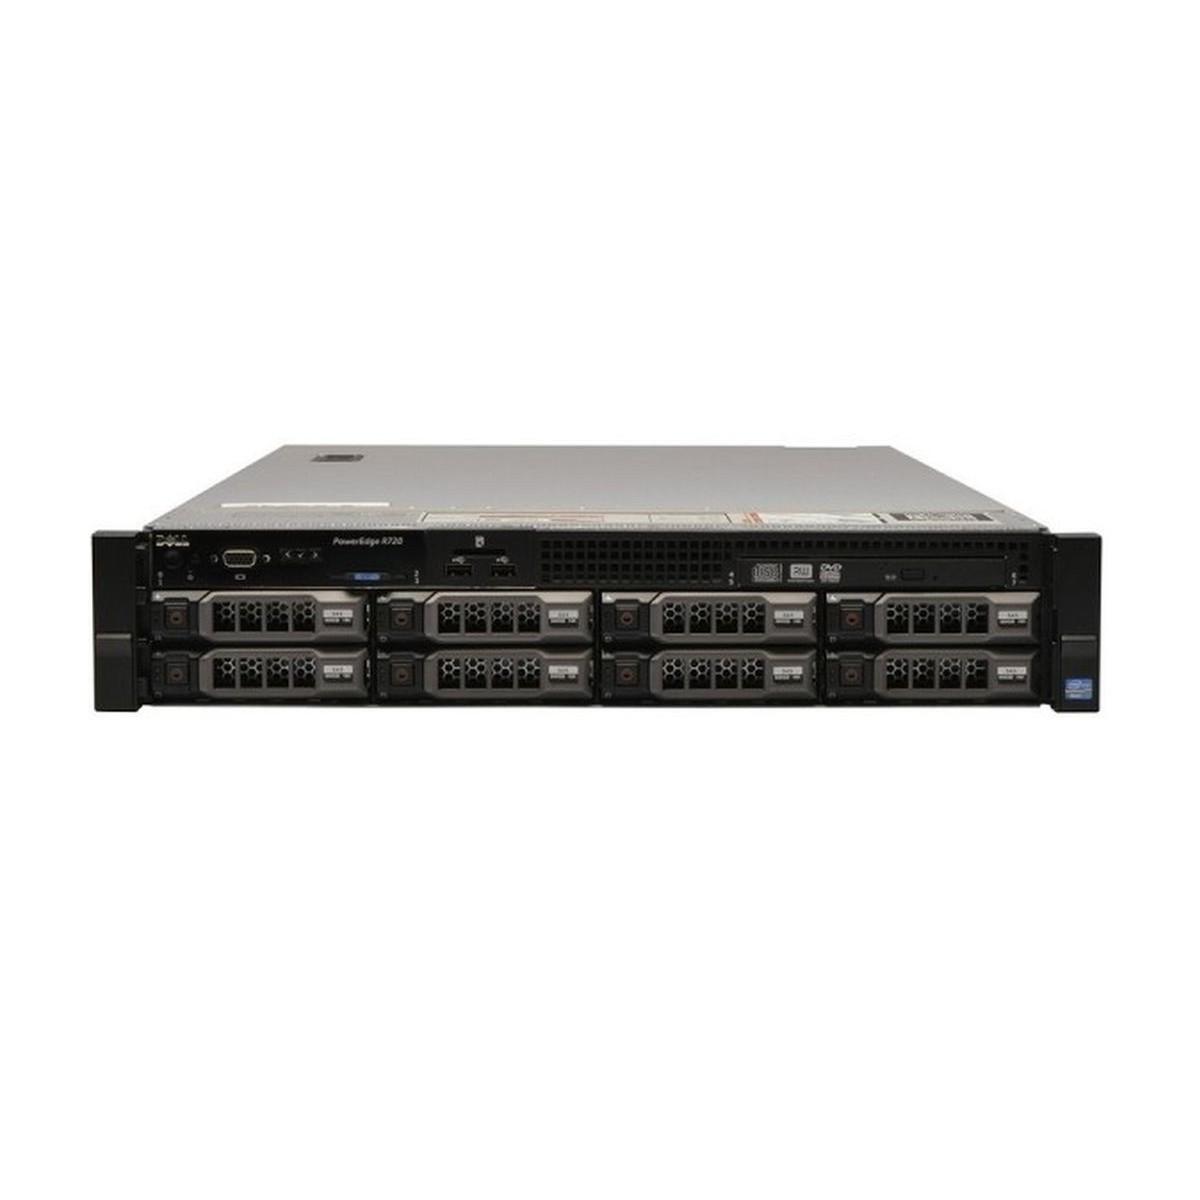 PAMIEC HP 4GB 1Rx4 PC2-3200 ECC REG 345115-061